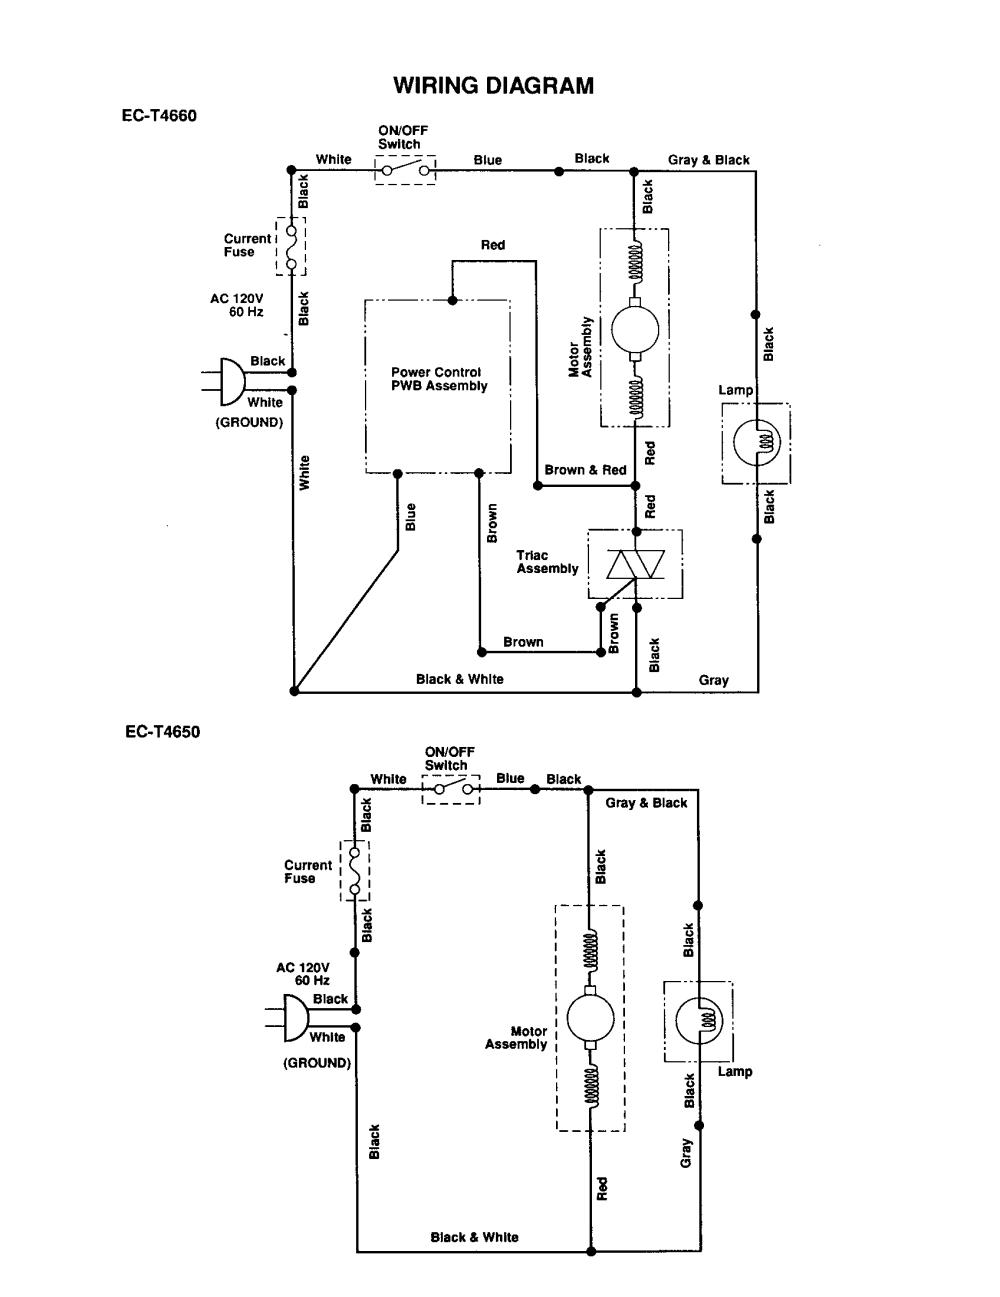 medium resolution of vacuum cleaner wiring diagrams wiring diagram centresharp upright vacuum cleaner parts model ec t4660 sears partsdirect